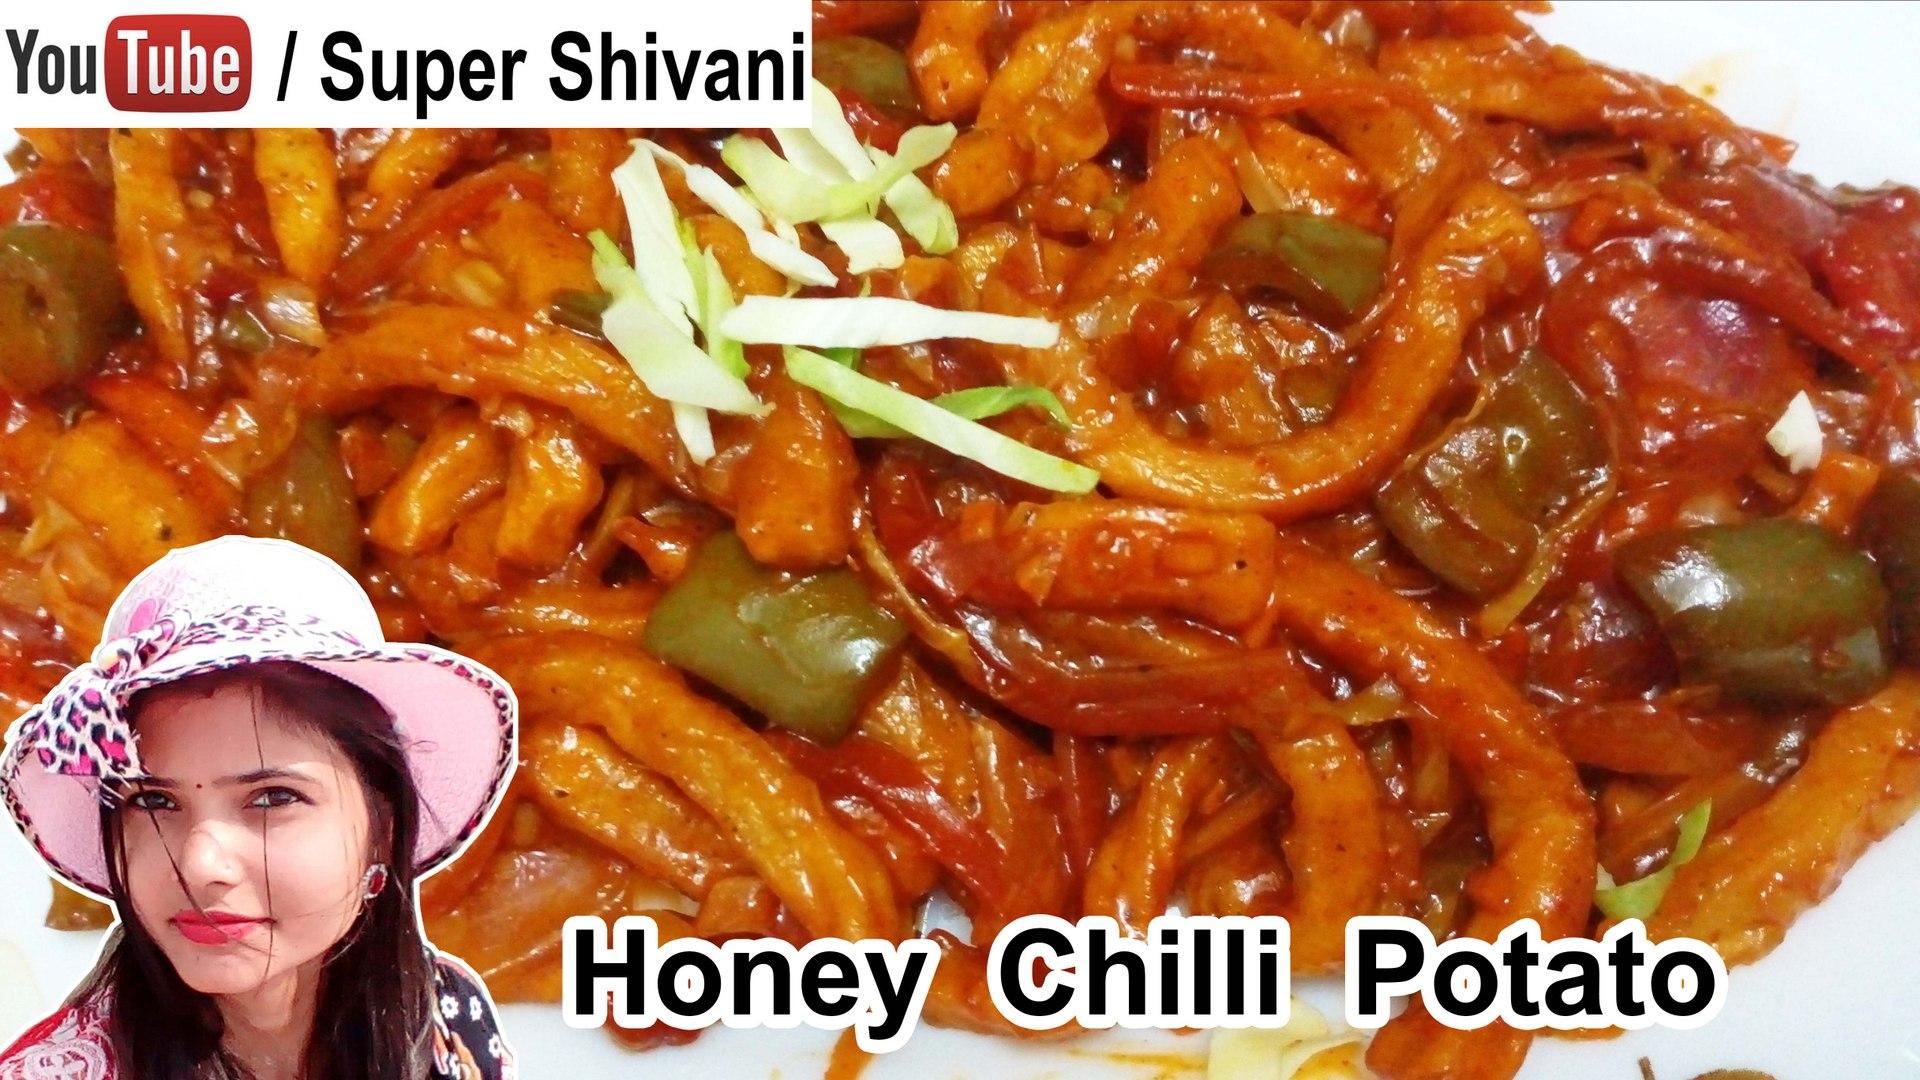 Honey Chilli Potatoes Recipe - Chilli Potatoes Recipe - Starter/Appetizer Recipe